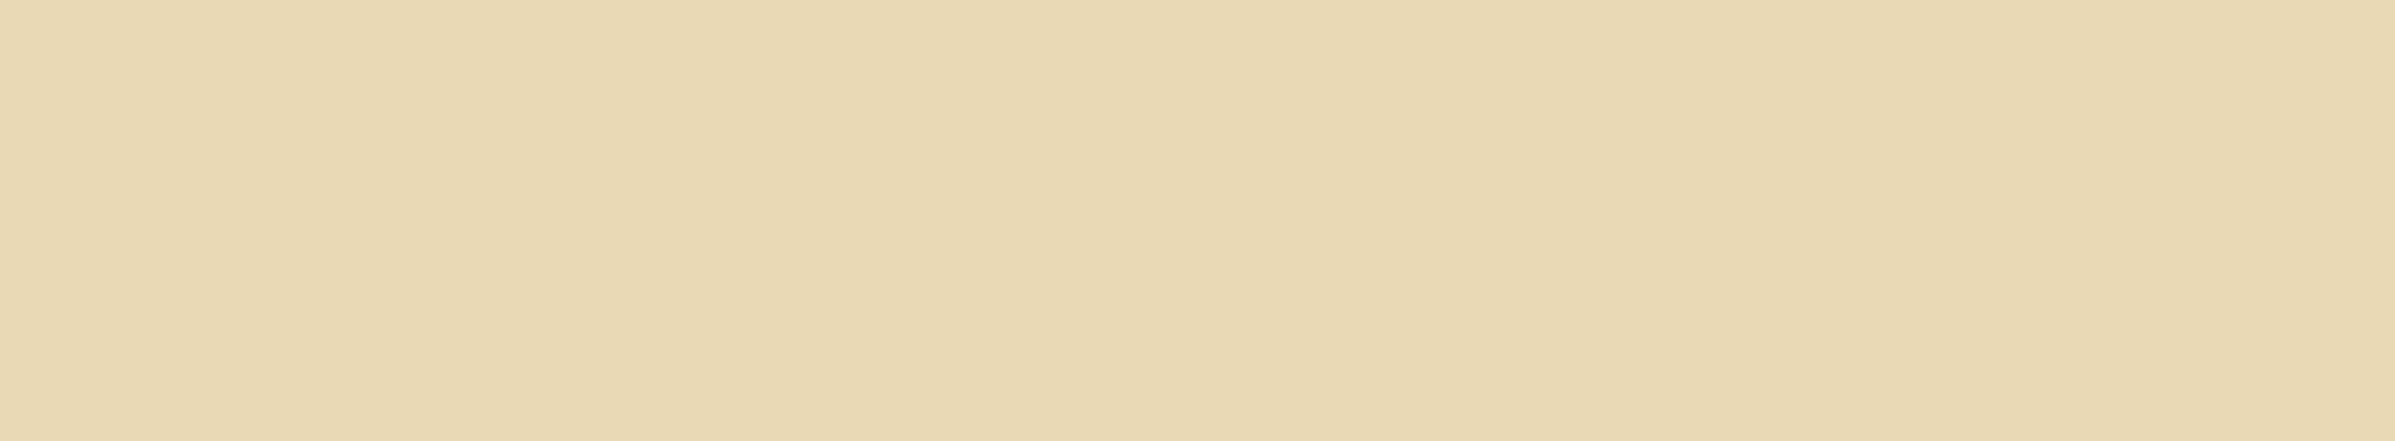 #24 @ 3% - White